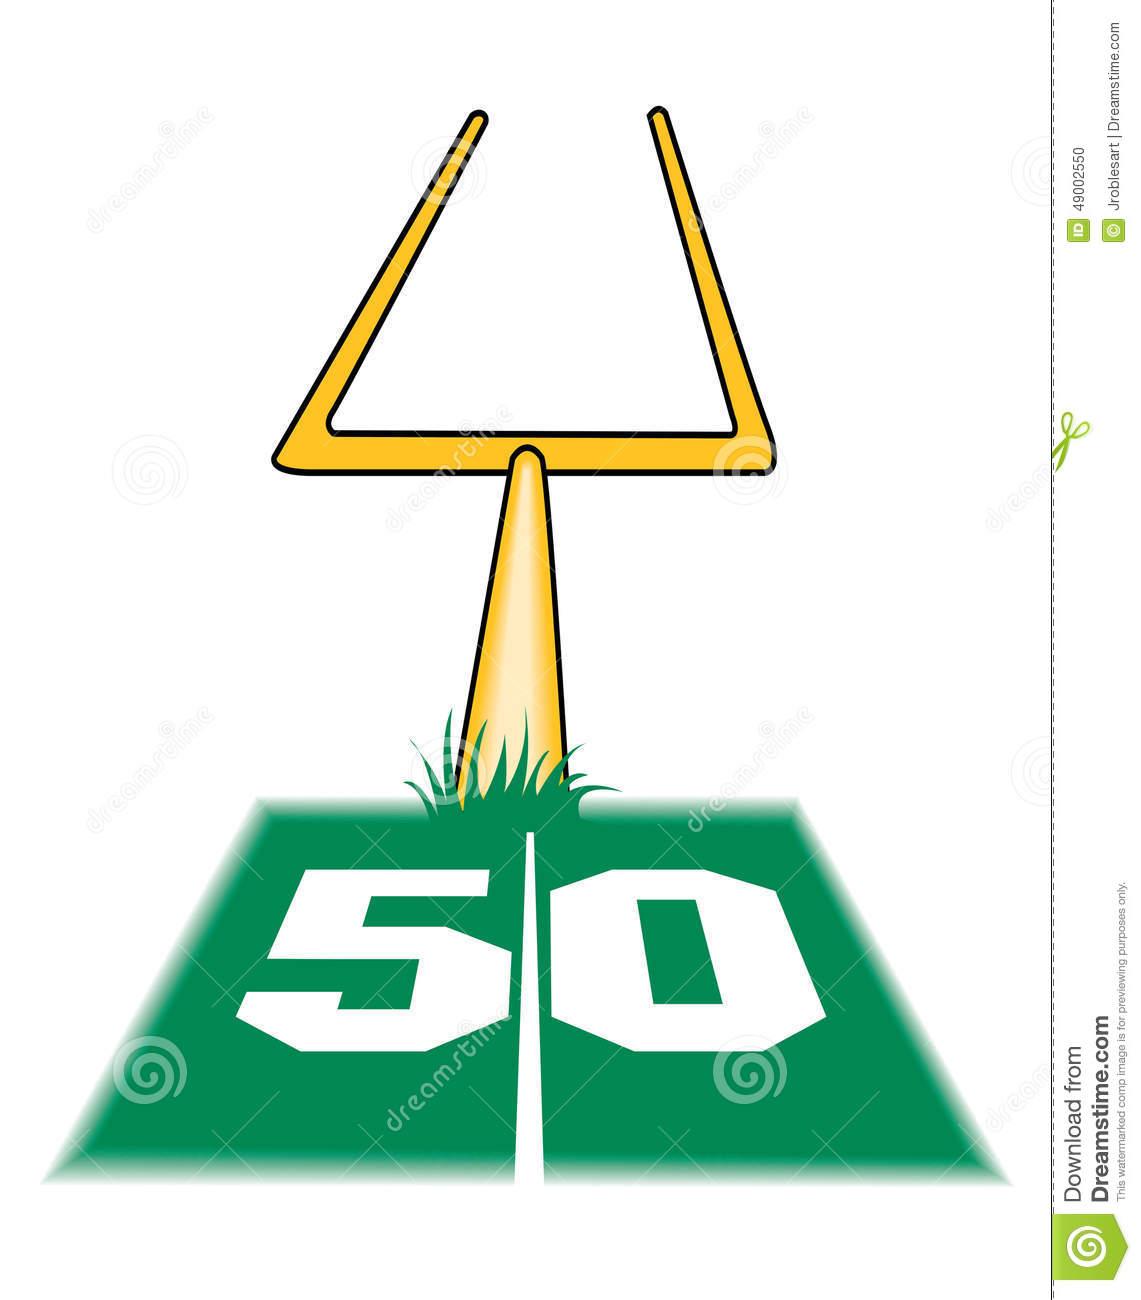 1141x1300 Clipart Football Goal Post